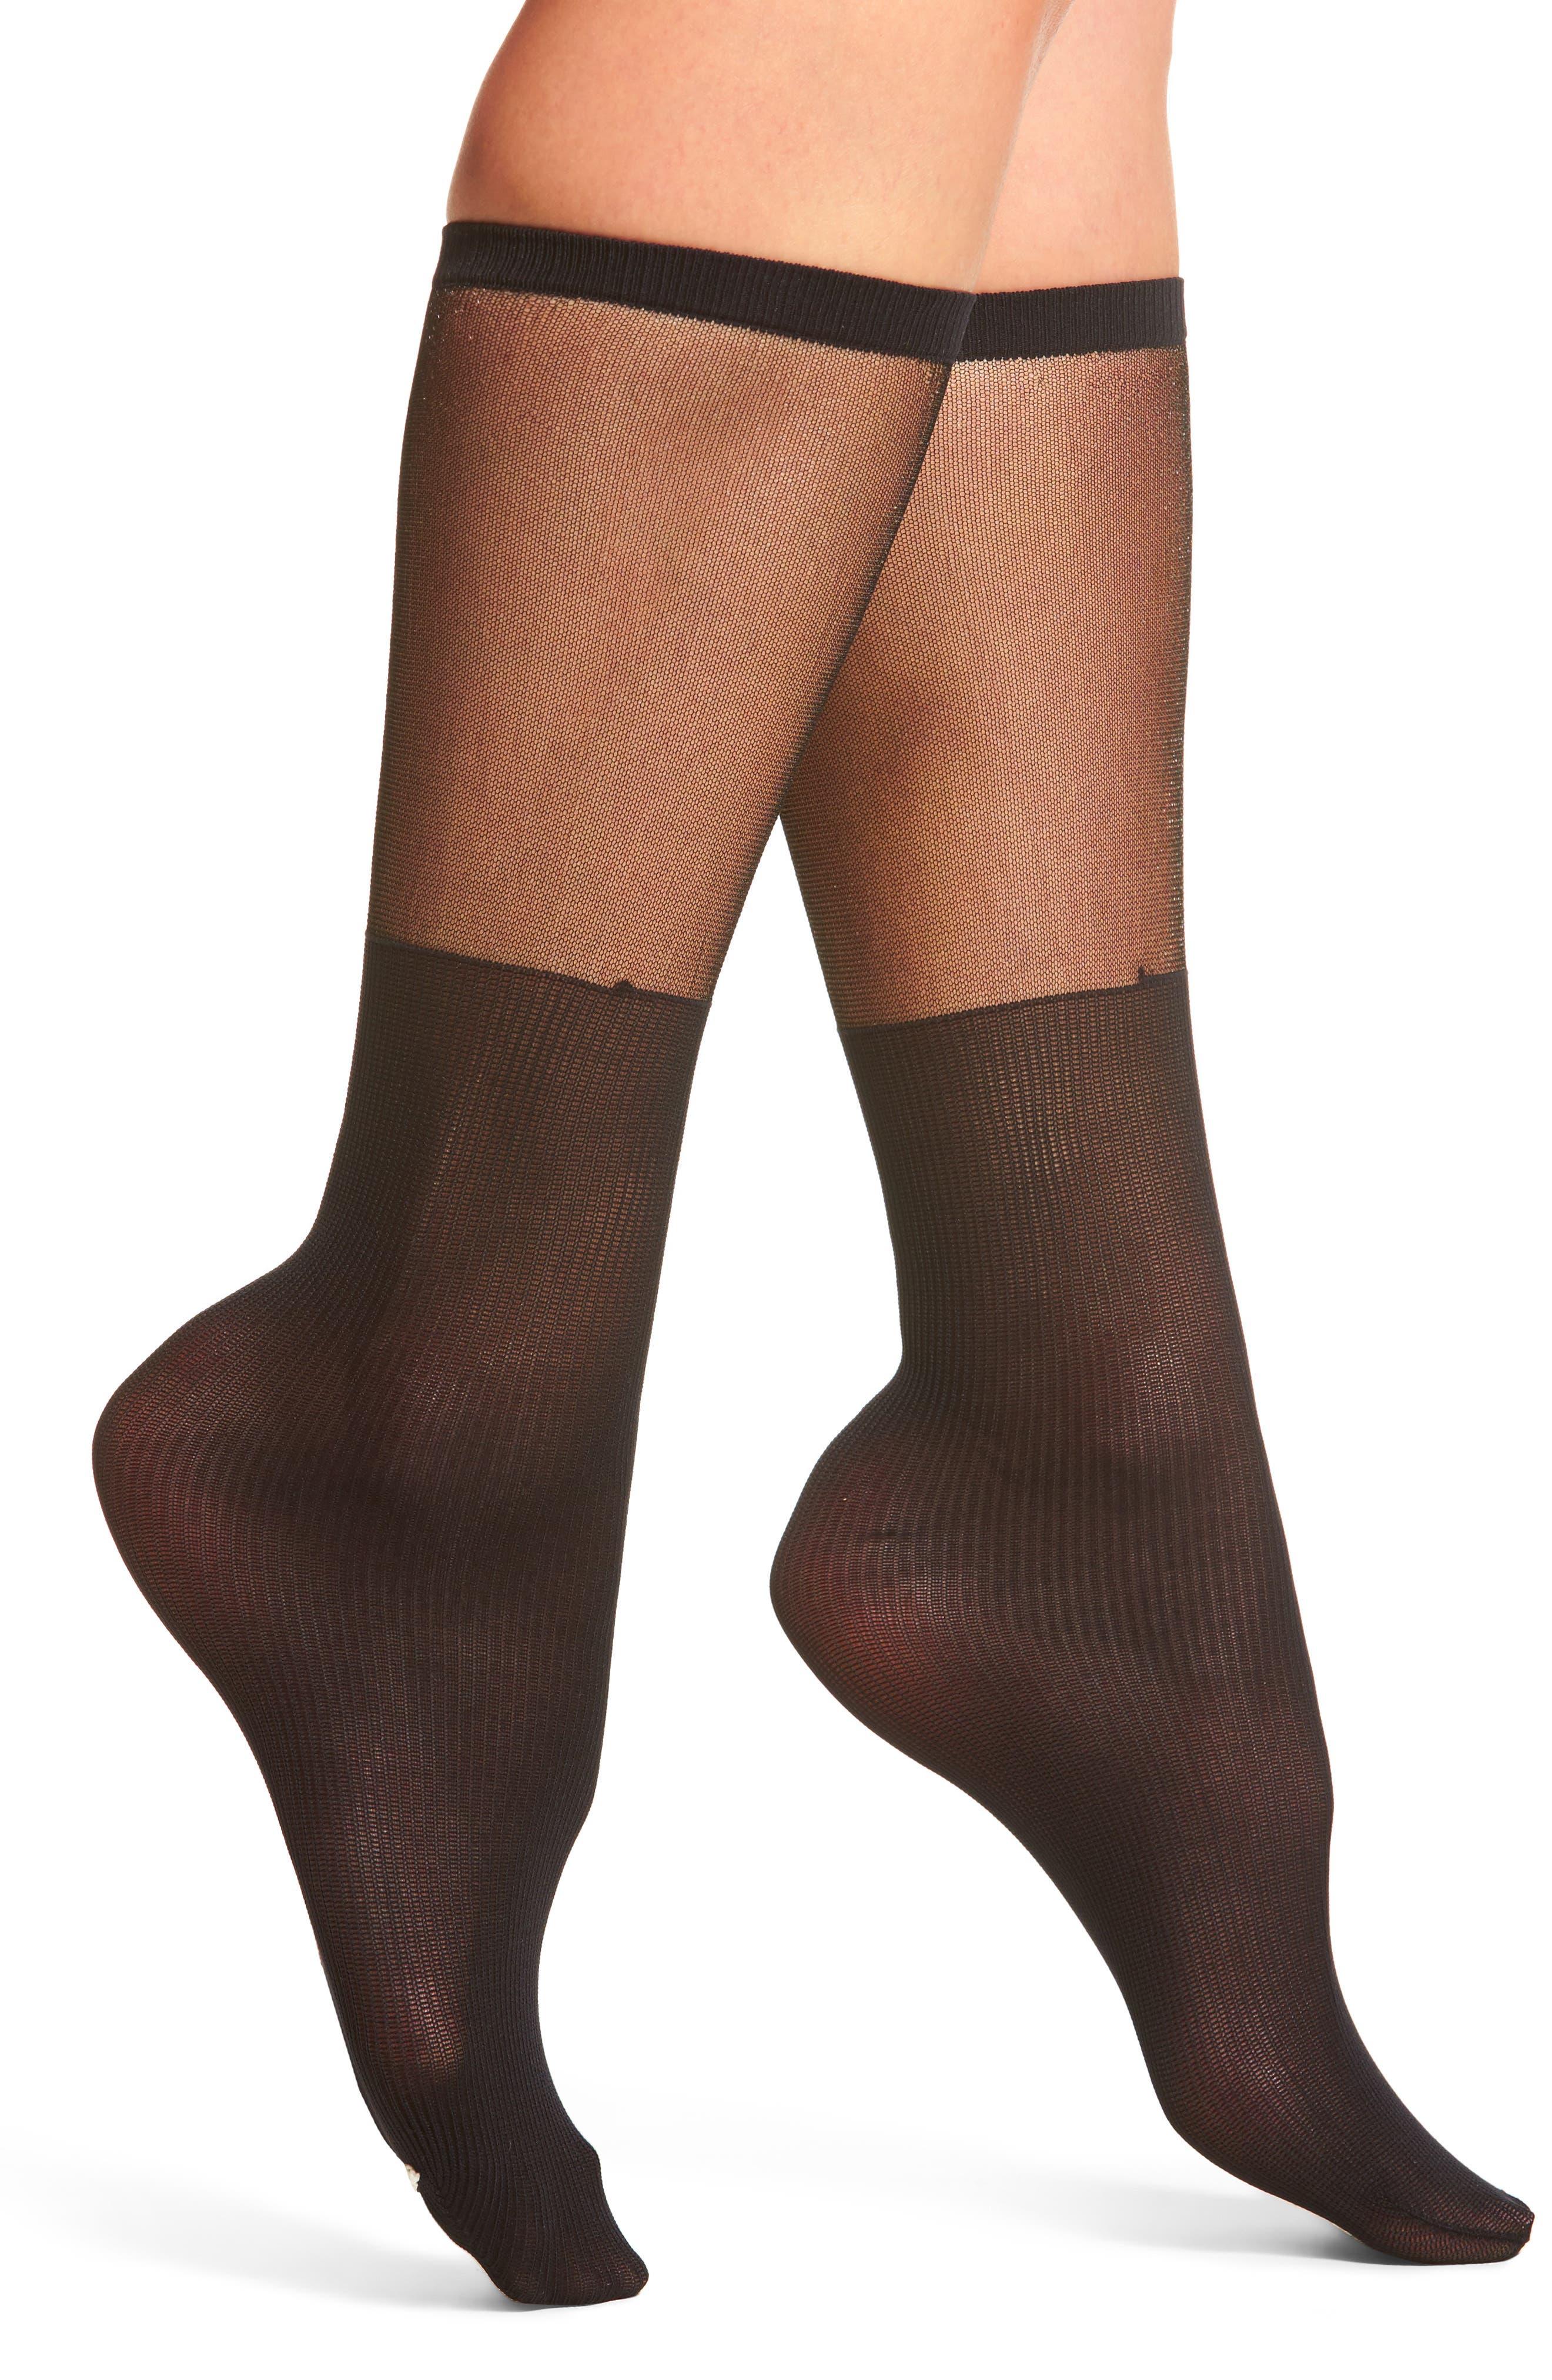 Marilu Socks,                         Main,                         color,